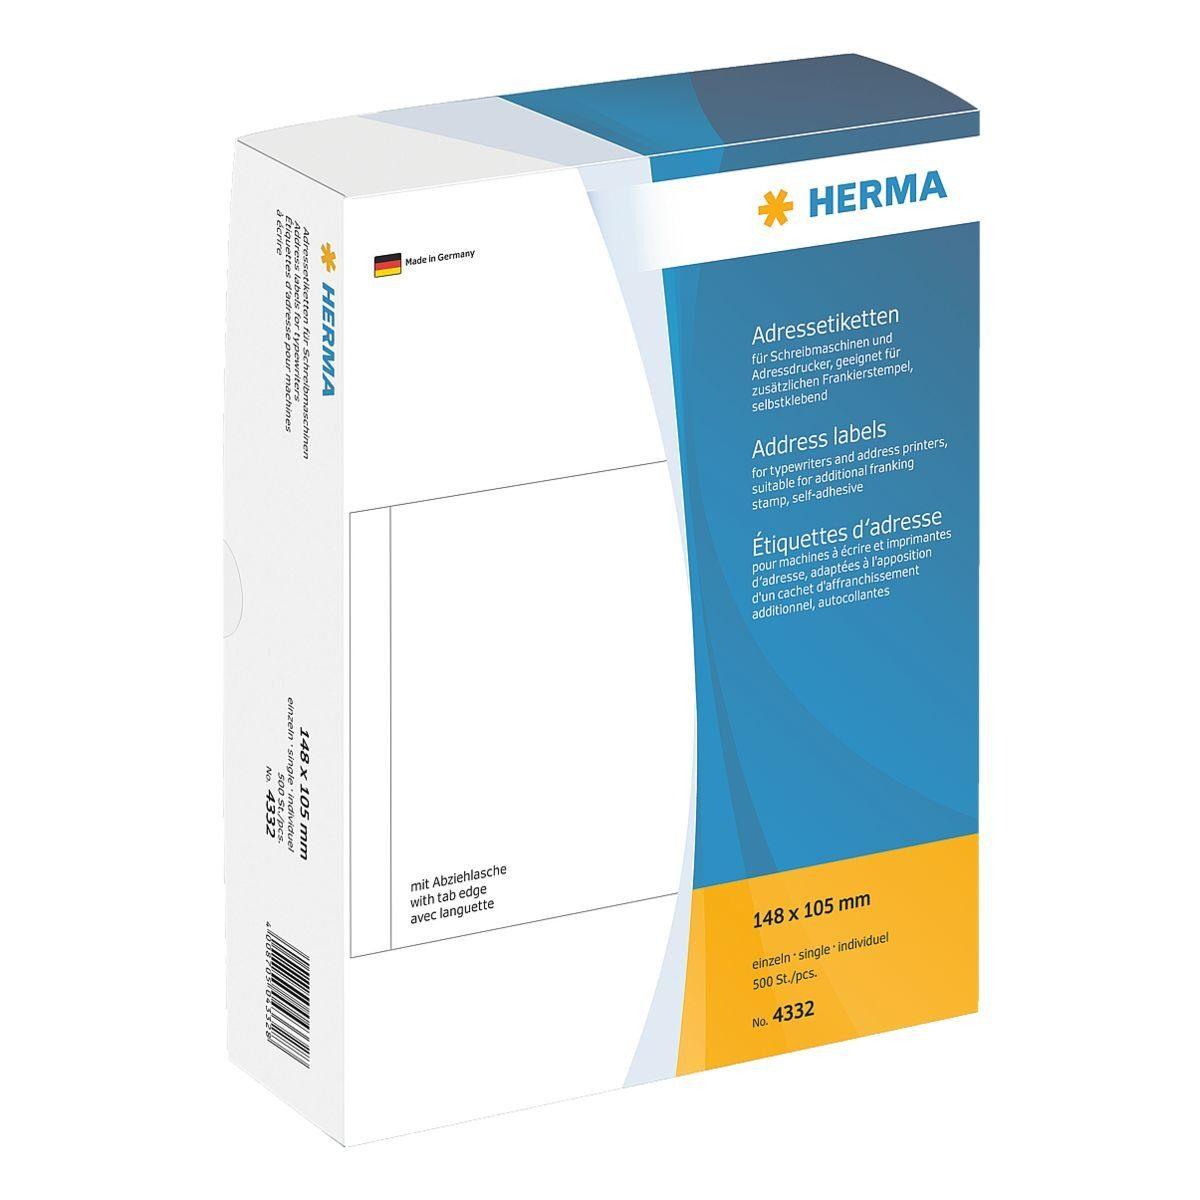 Herma 500er-Pack Adressetiketten »4332«